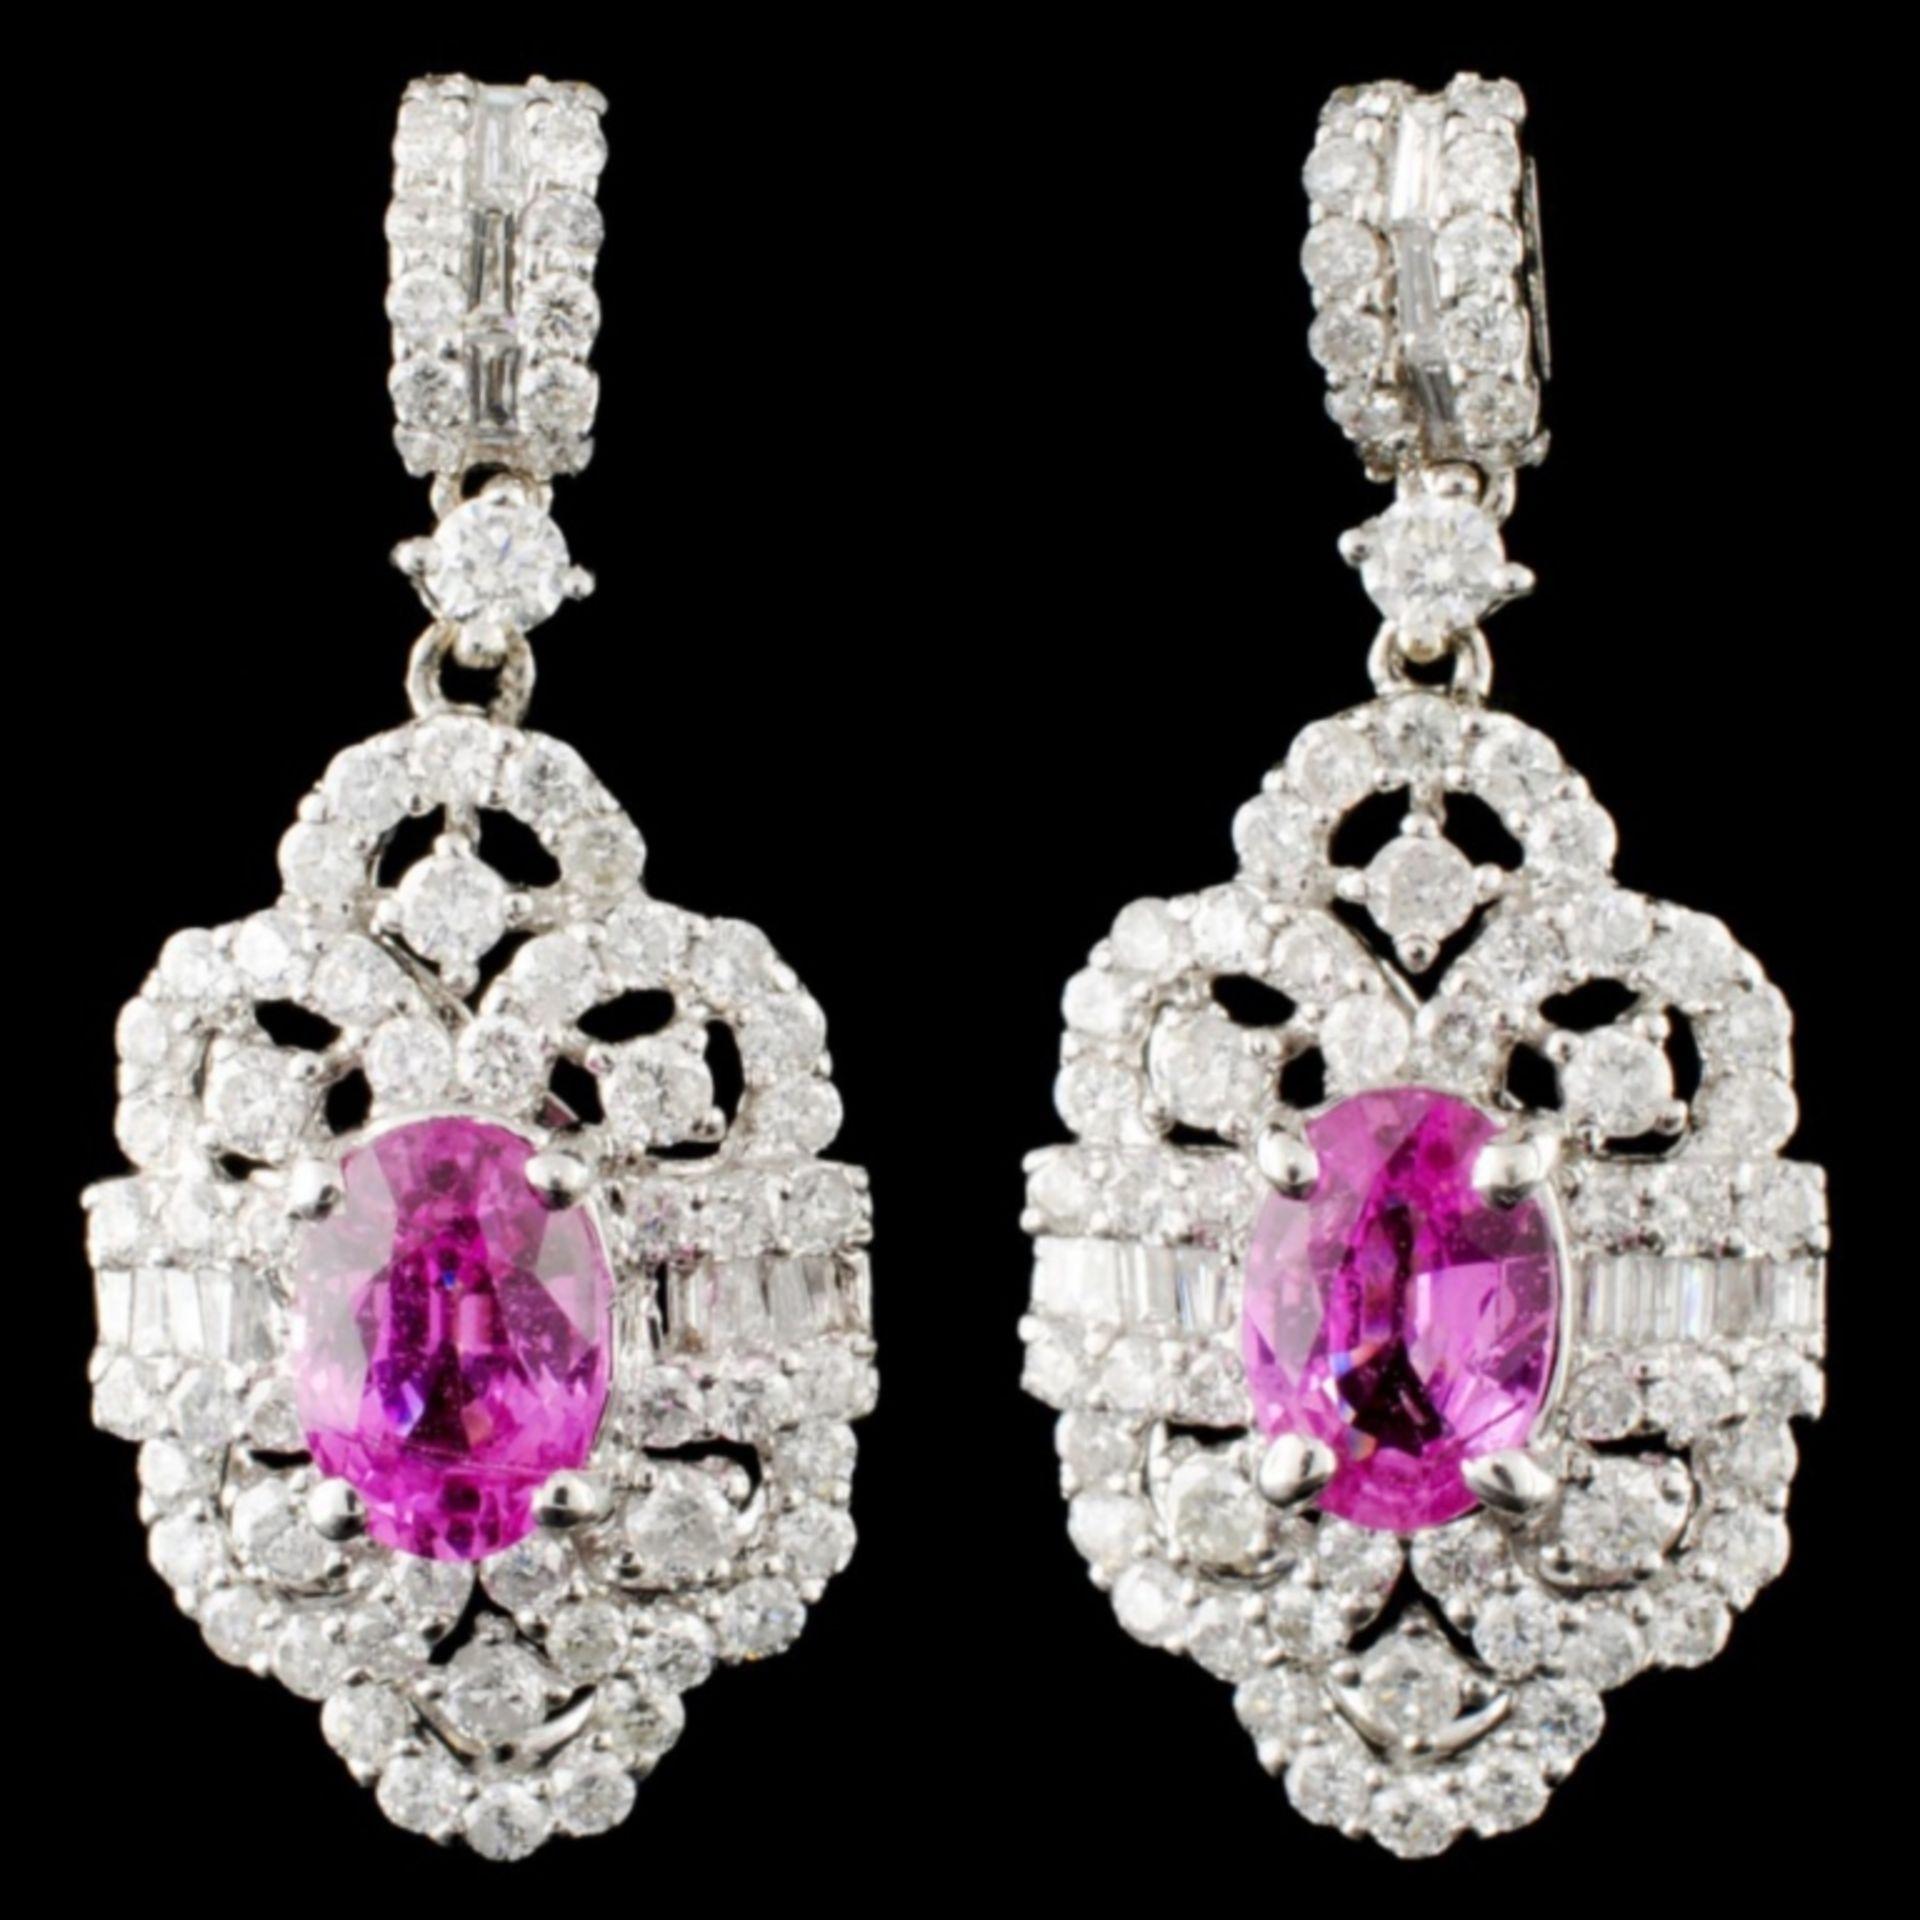 18K Gold 1.51ct Sapphire & 1.46ctw Diamond Earring